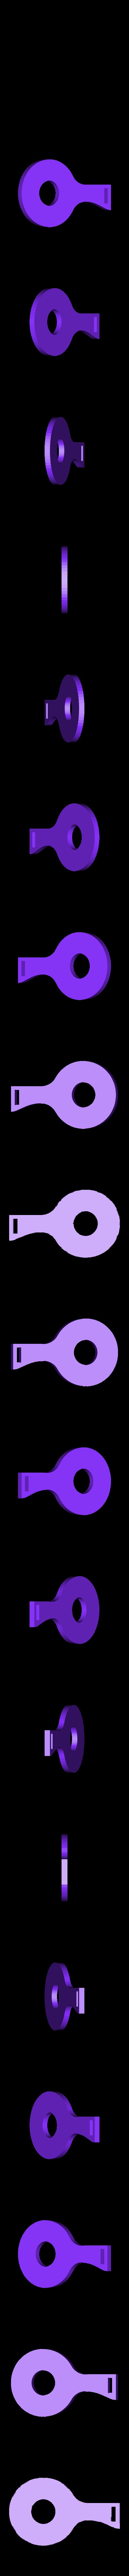 Clockwise Mechanism Gear Side Clip Attachment.stl Download STL file Clockwise Mechanism • 3D printer model, Chrisibub